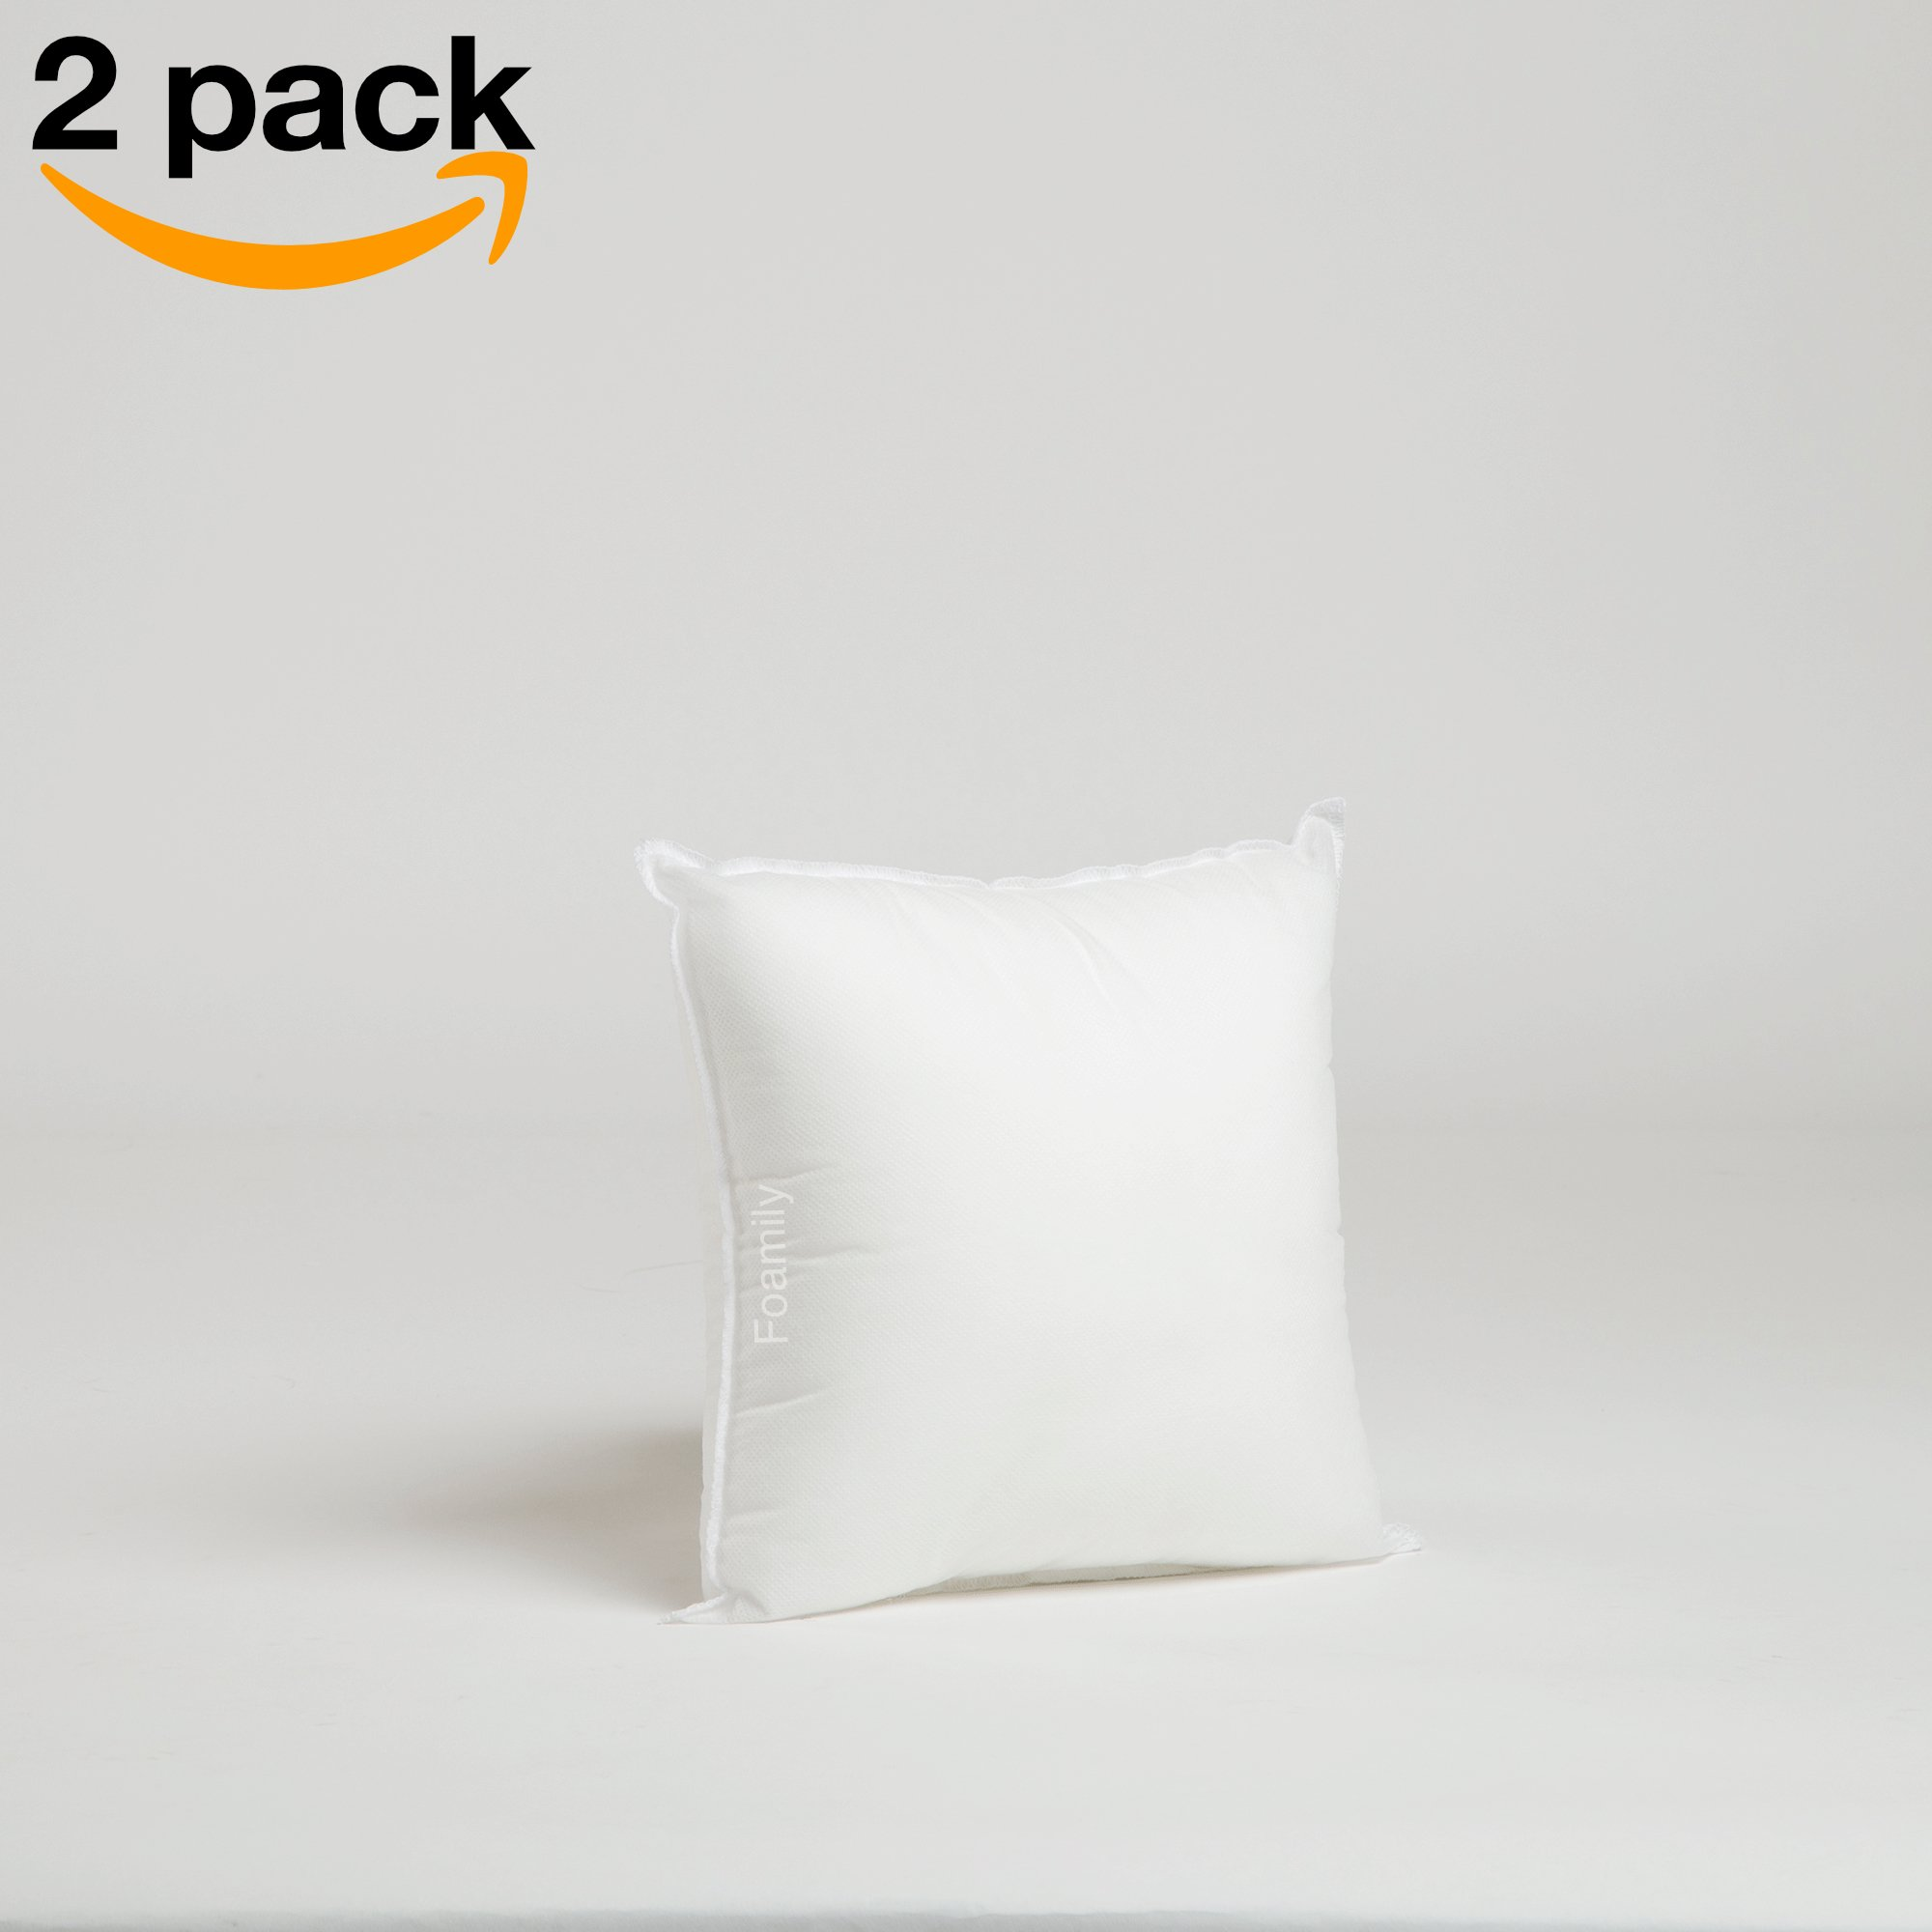 Set of 2-12 x 12 Premium Hypoallergenic Stuffer Pillow Insert Sham Square Form Polyester, Standard/White - MADE IN USA